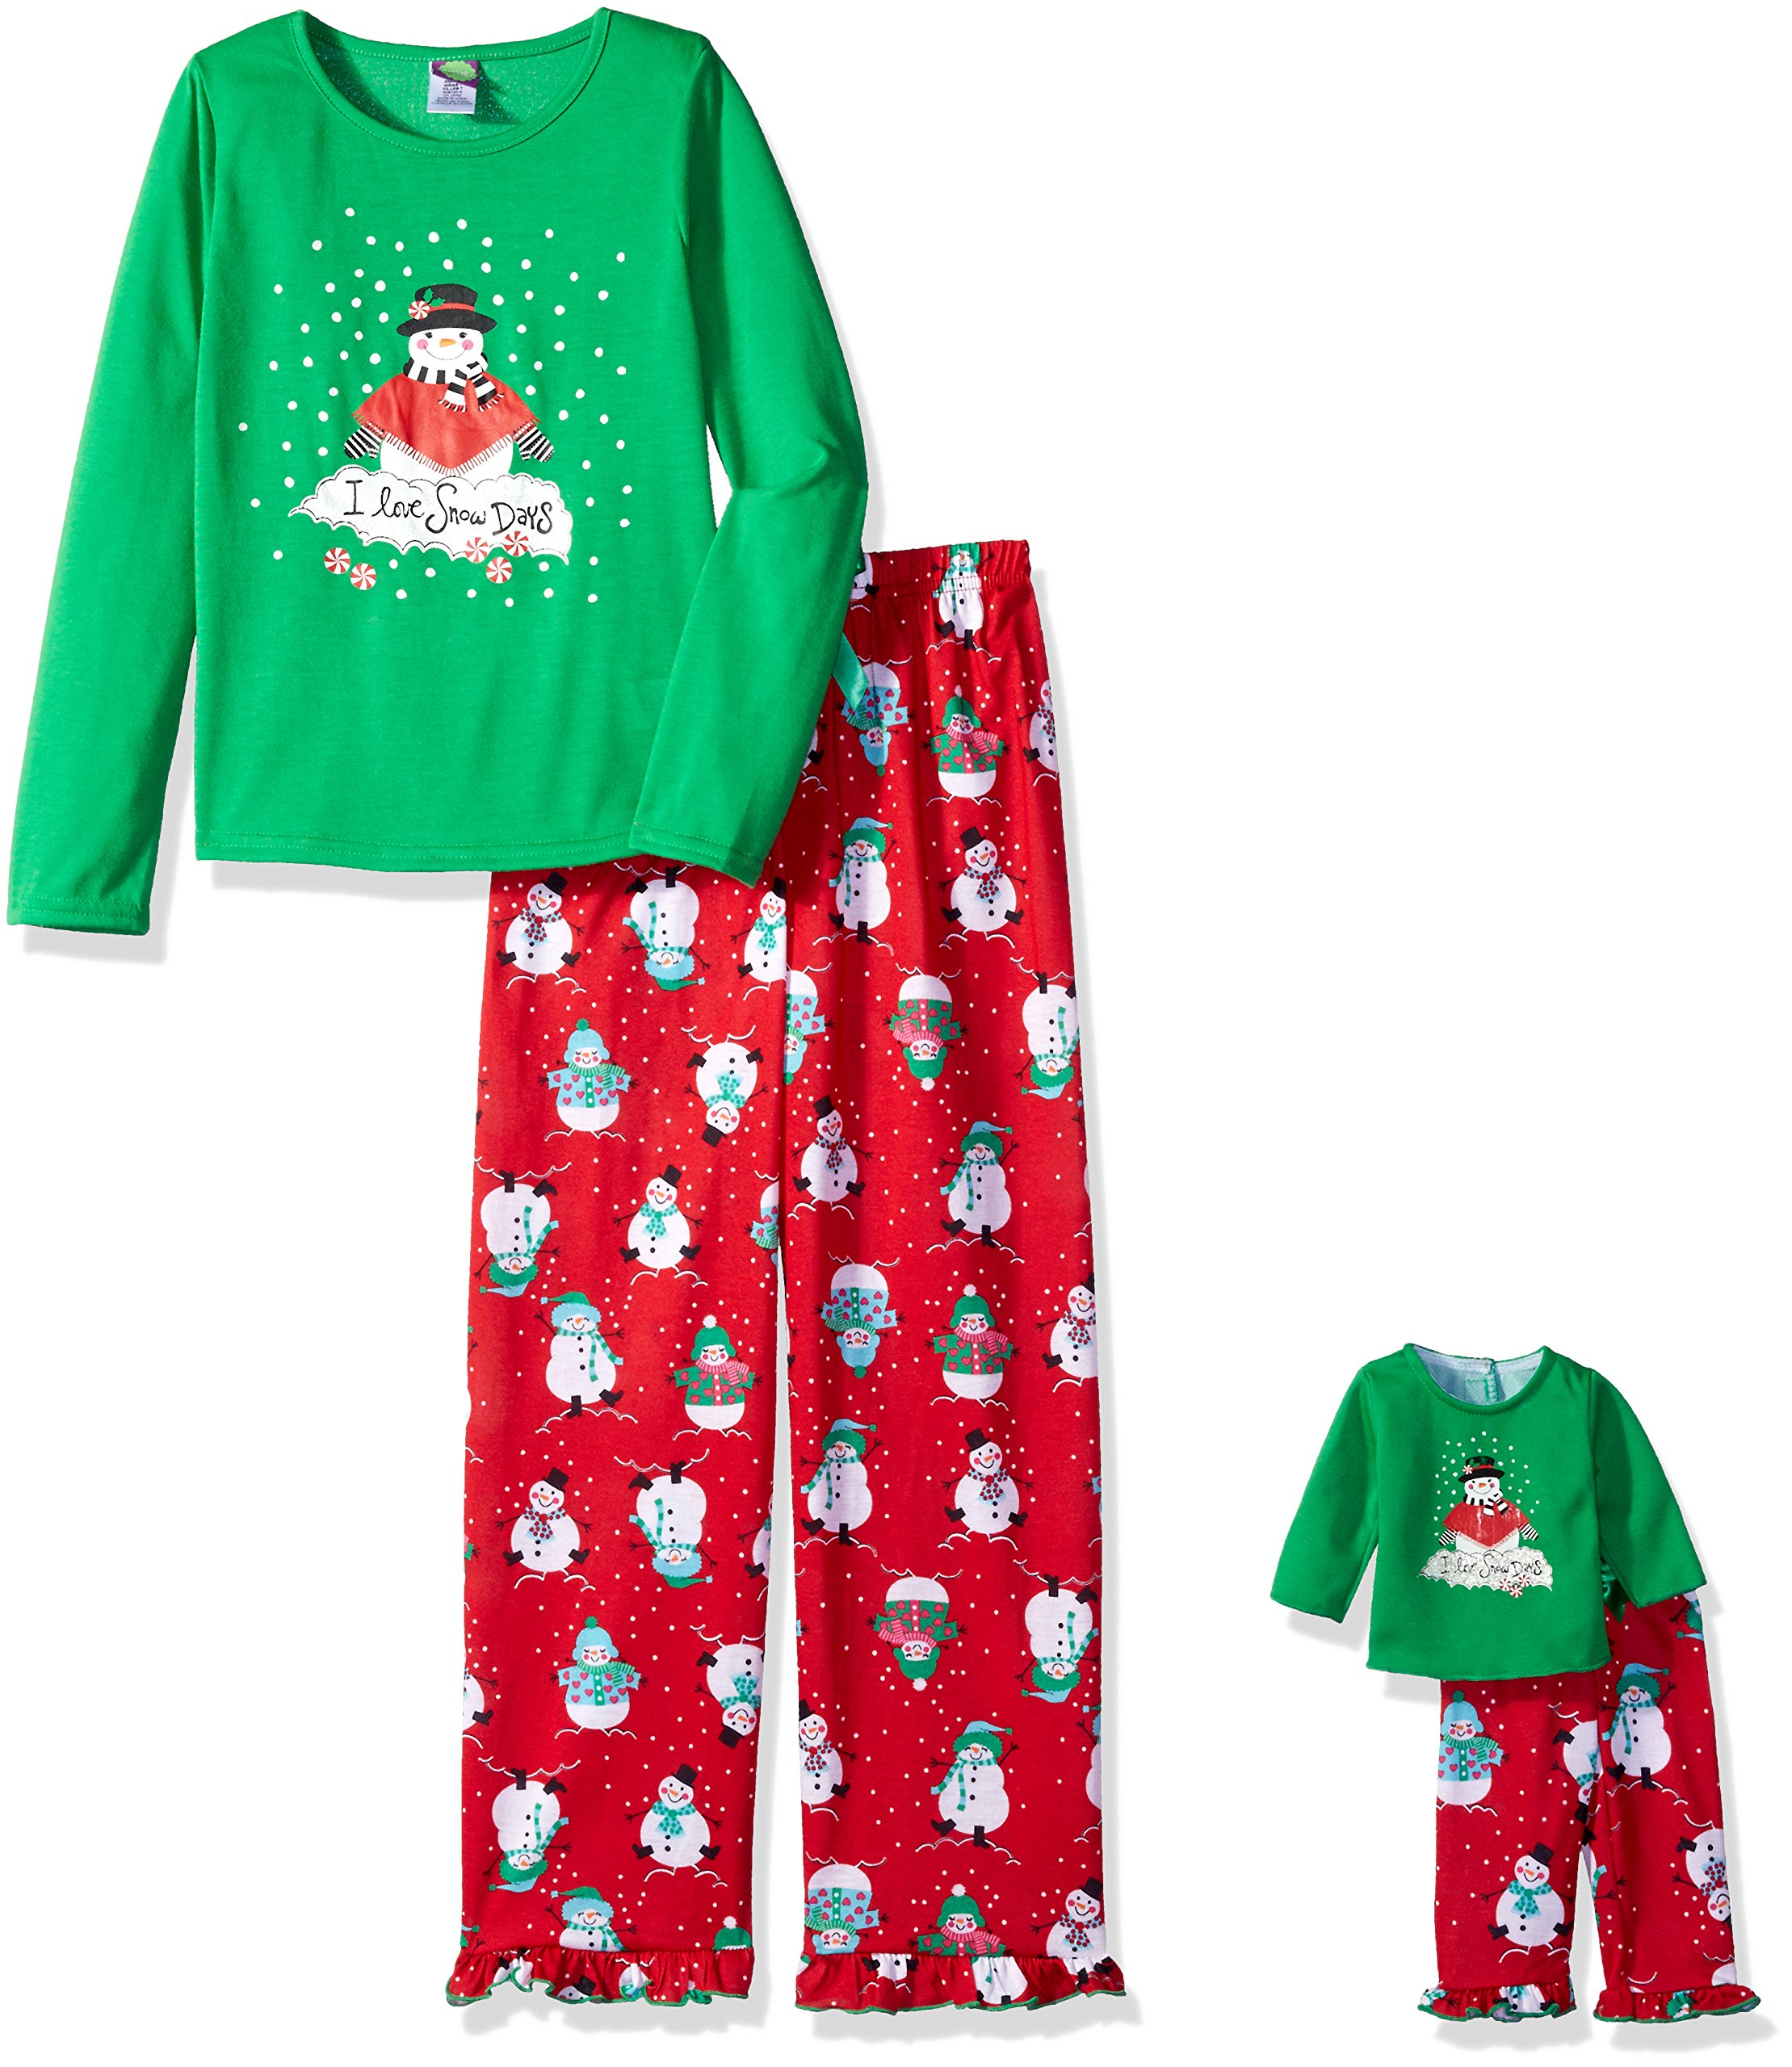 Dollie & Me Big Girls' Snowman I Love Snow Days Sleepwear Set, Red/Green, 12 by Dollie & Me (Image #1)